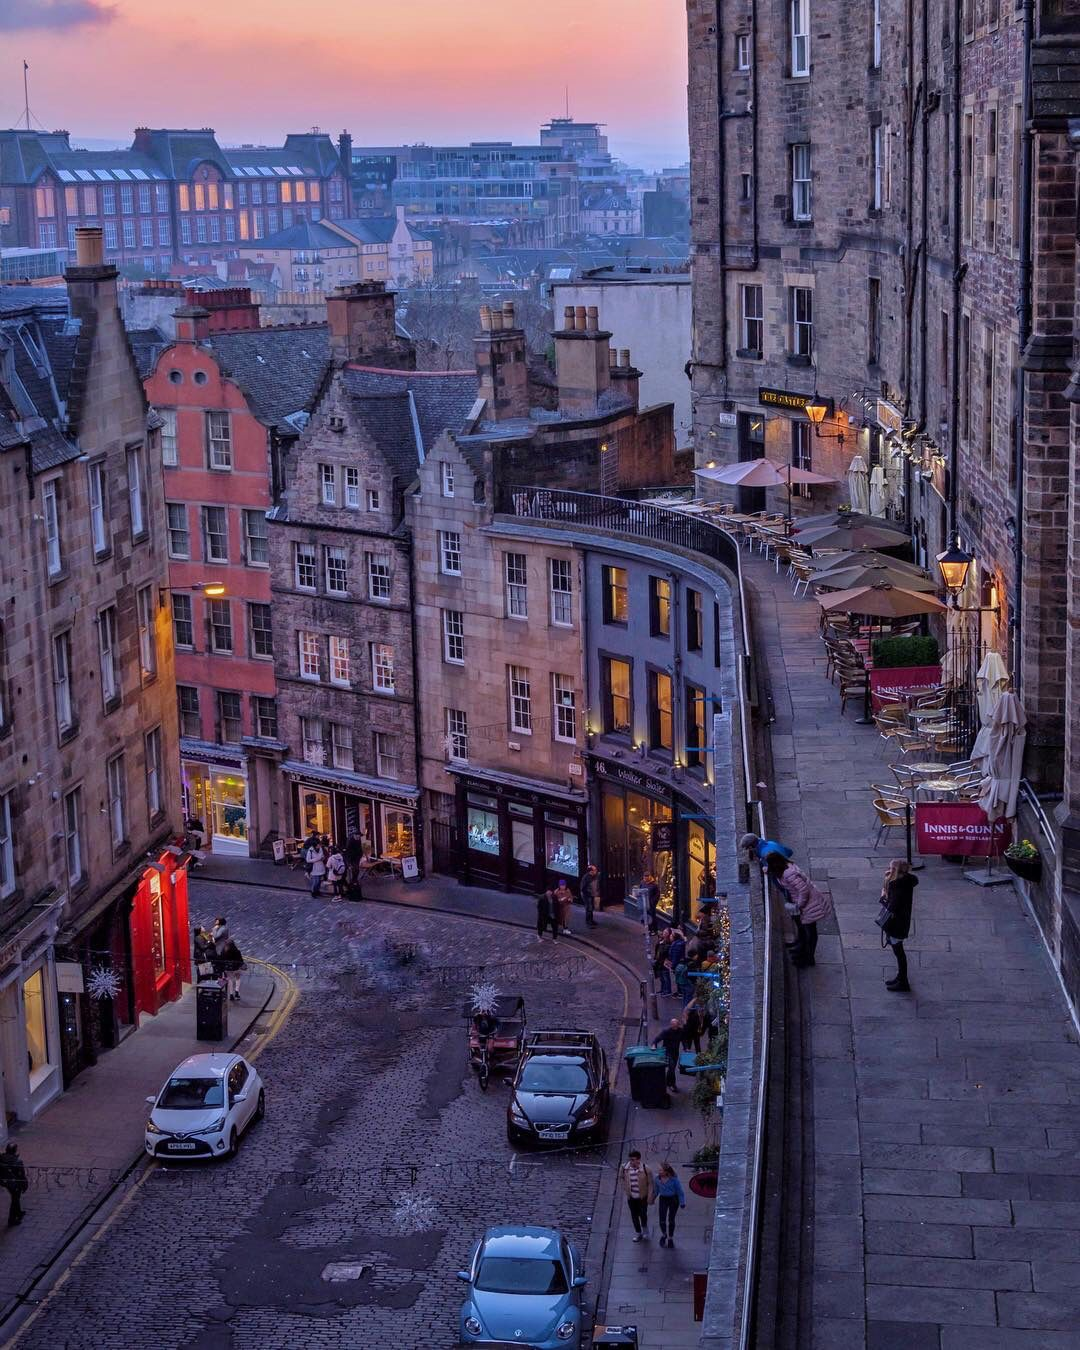 Edinburgh United Kingdom Scotland Vacation Places To Travel Scotland Travel